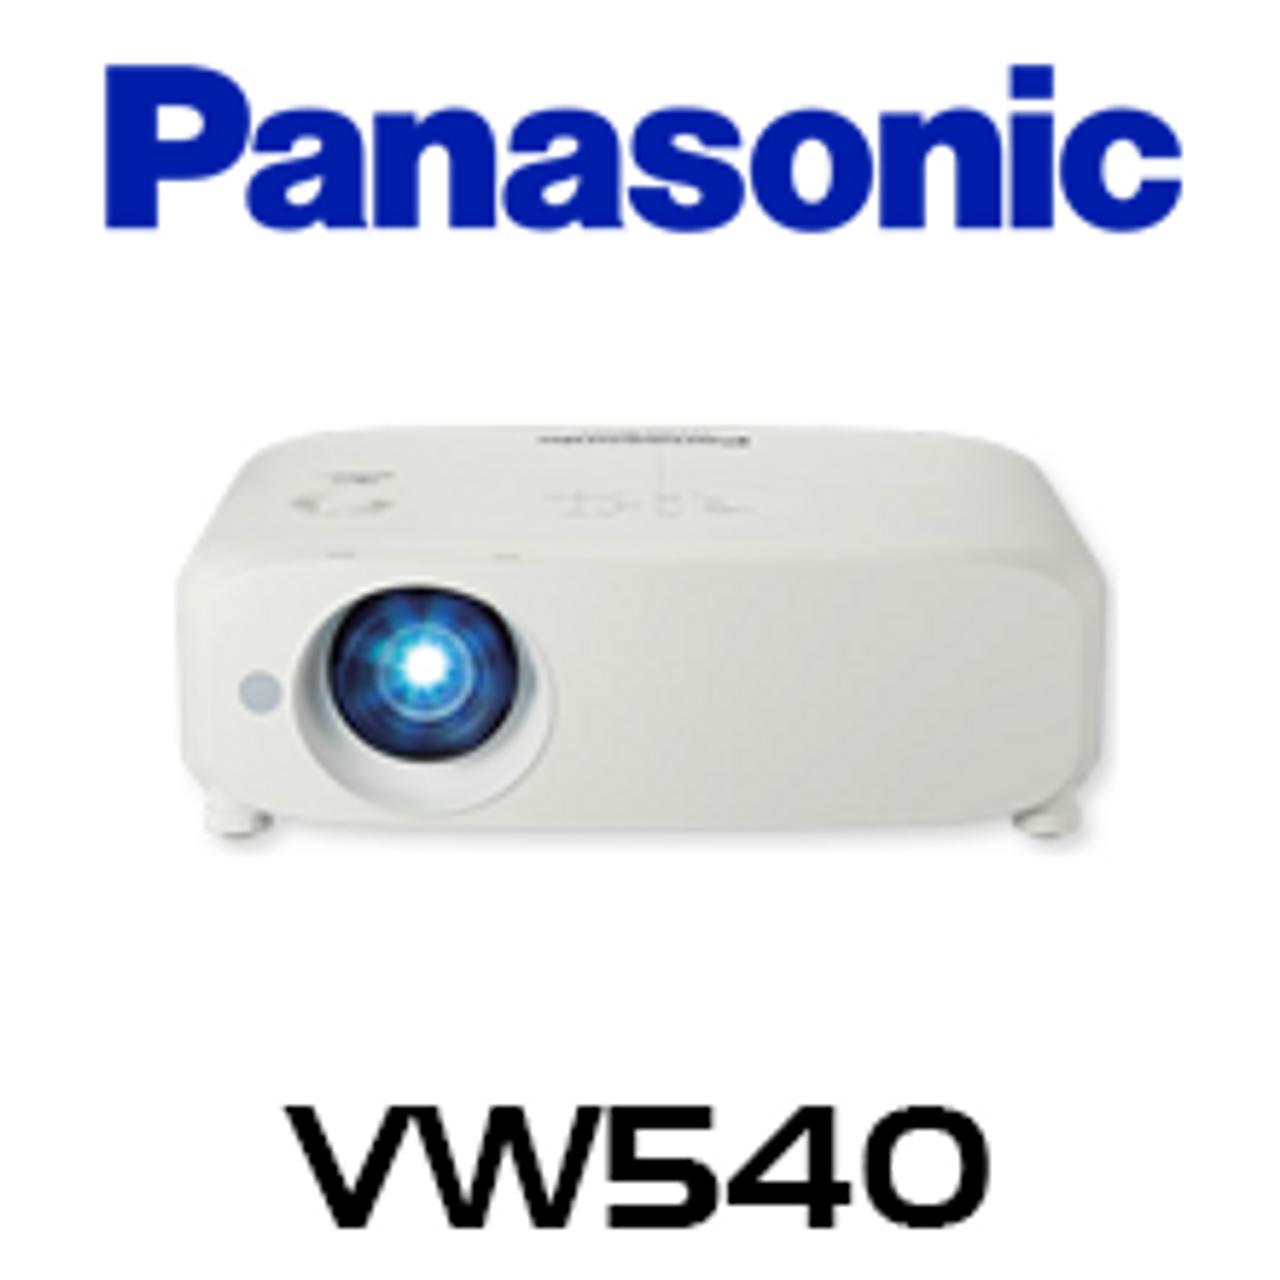 panasonic pt vw540 wxga 5500 lumens portable lcd projector av rh avaustralia com au Panasonic Viera Manual Panasonic TV Manual